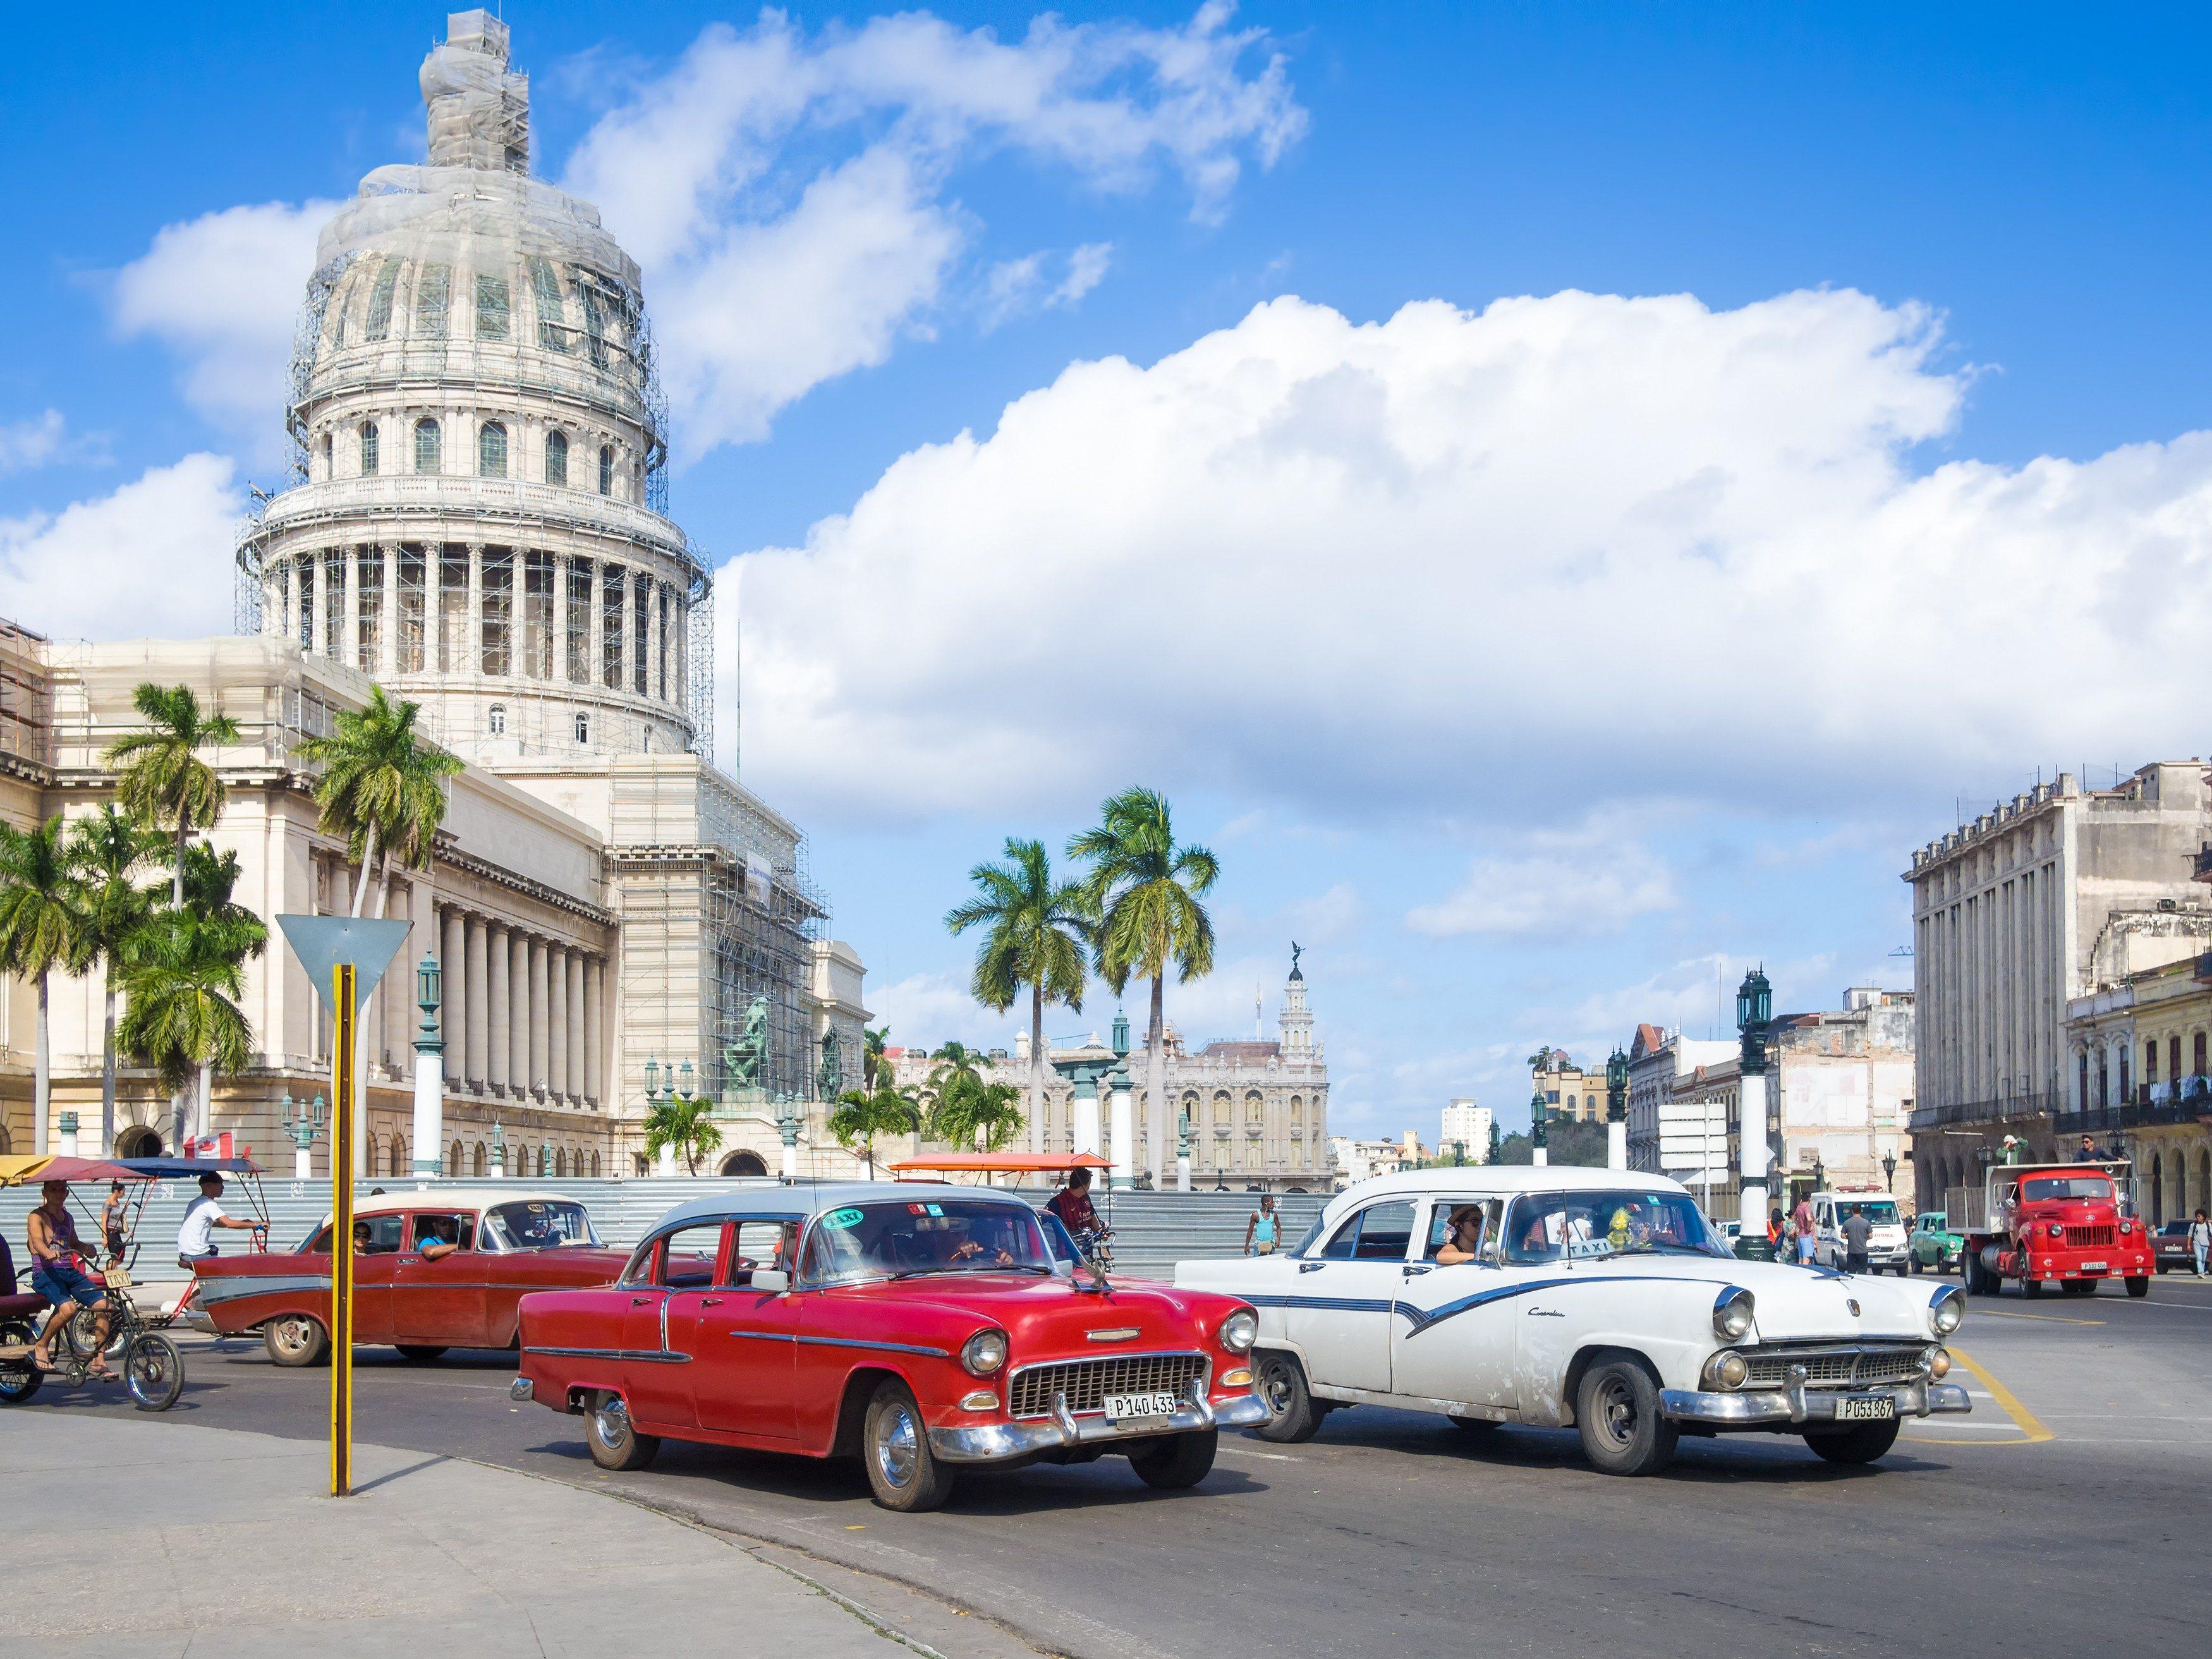 5. The Modern City, Havana, Cuba